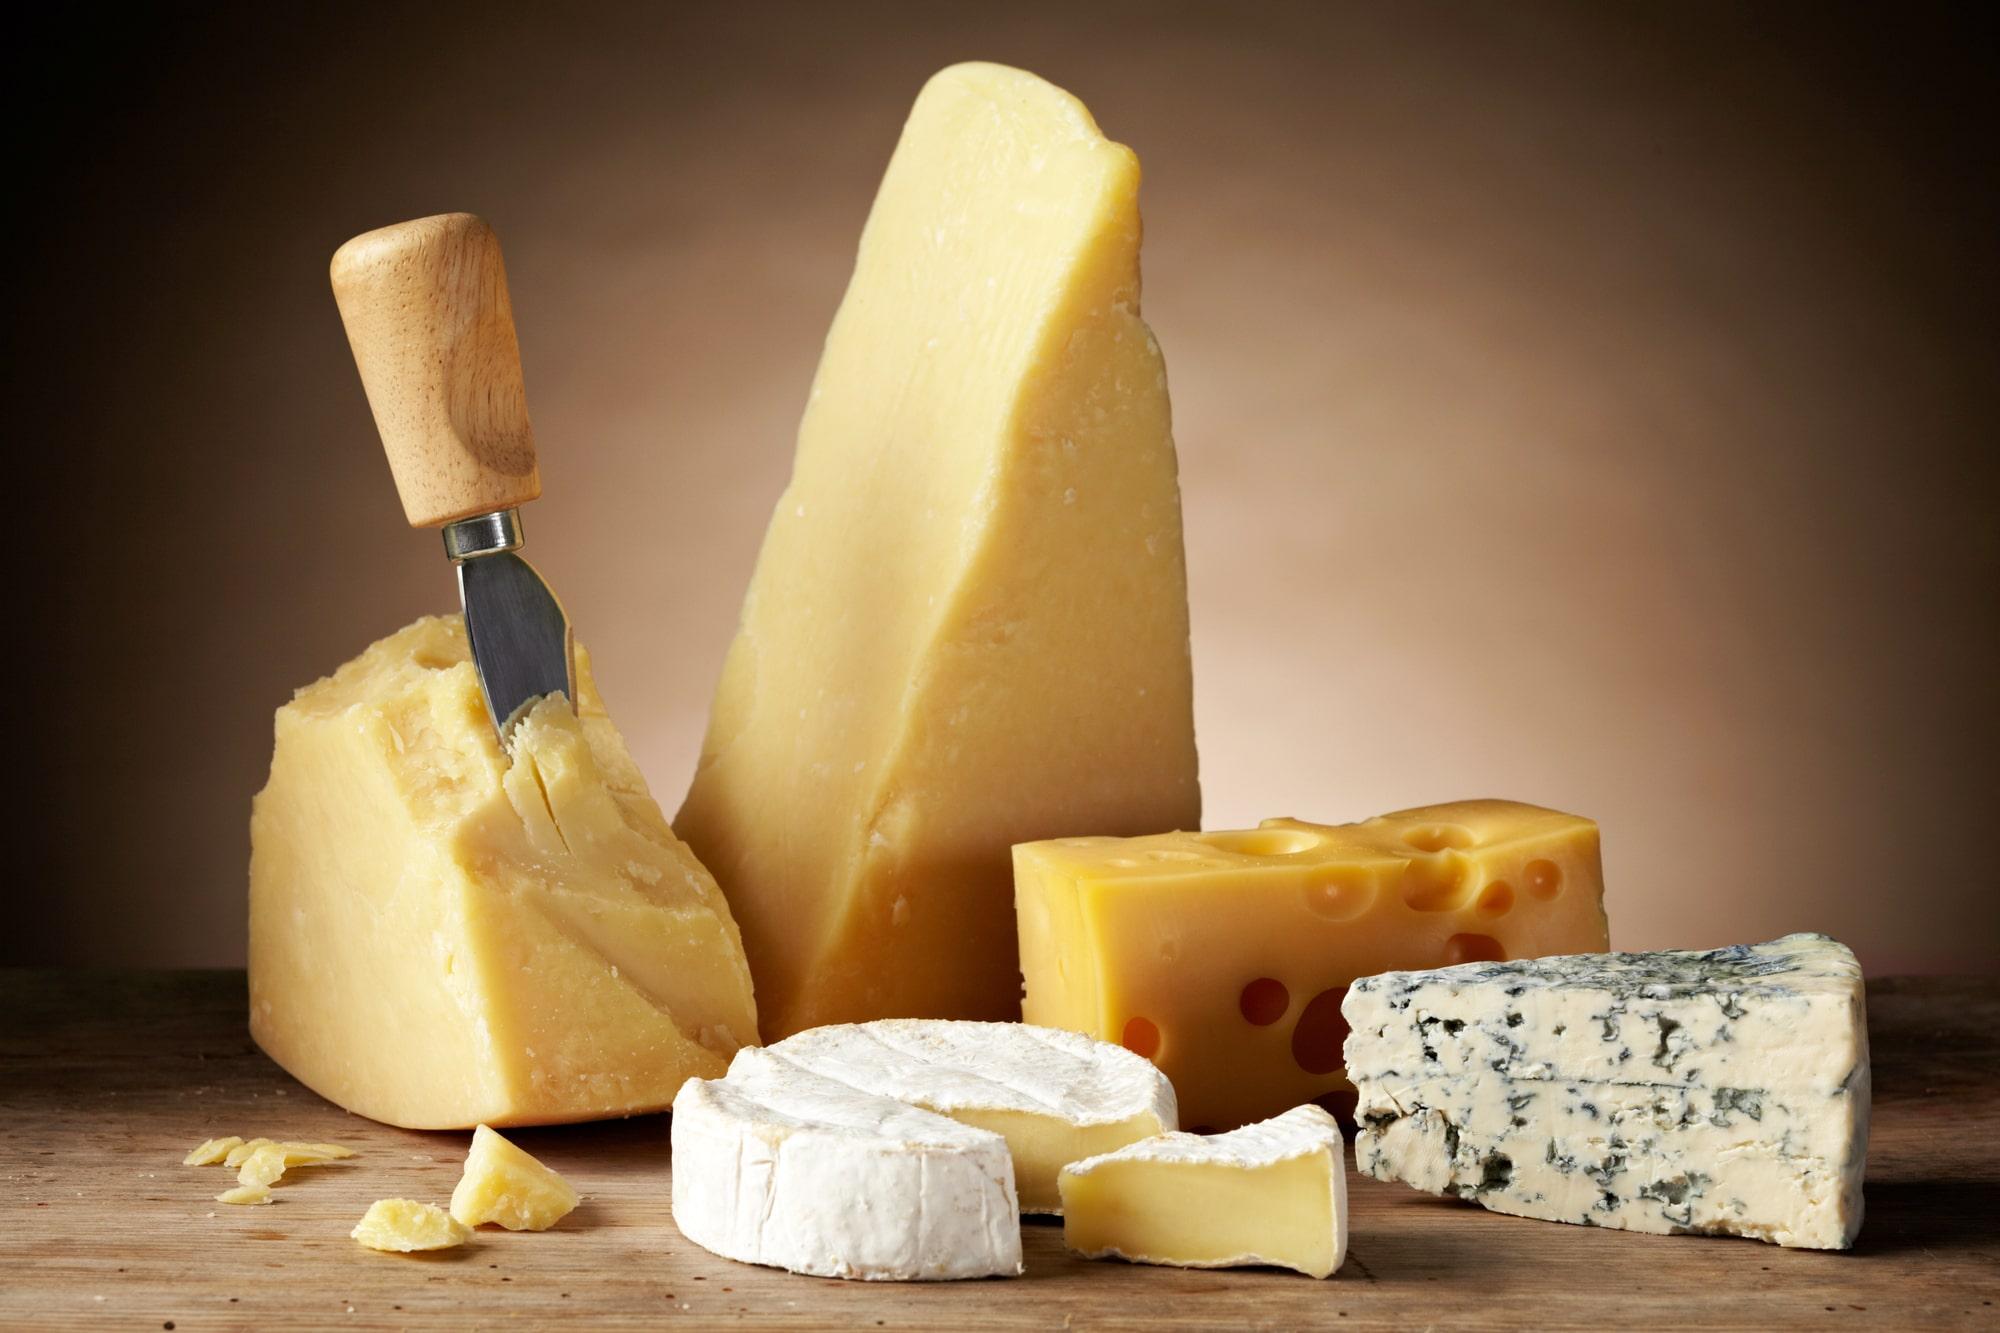 Laktosefreier Käse